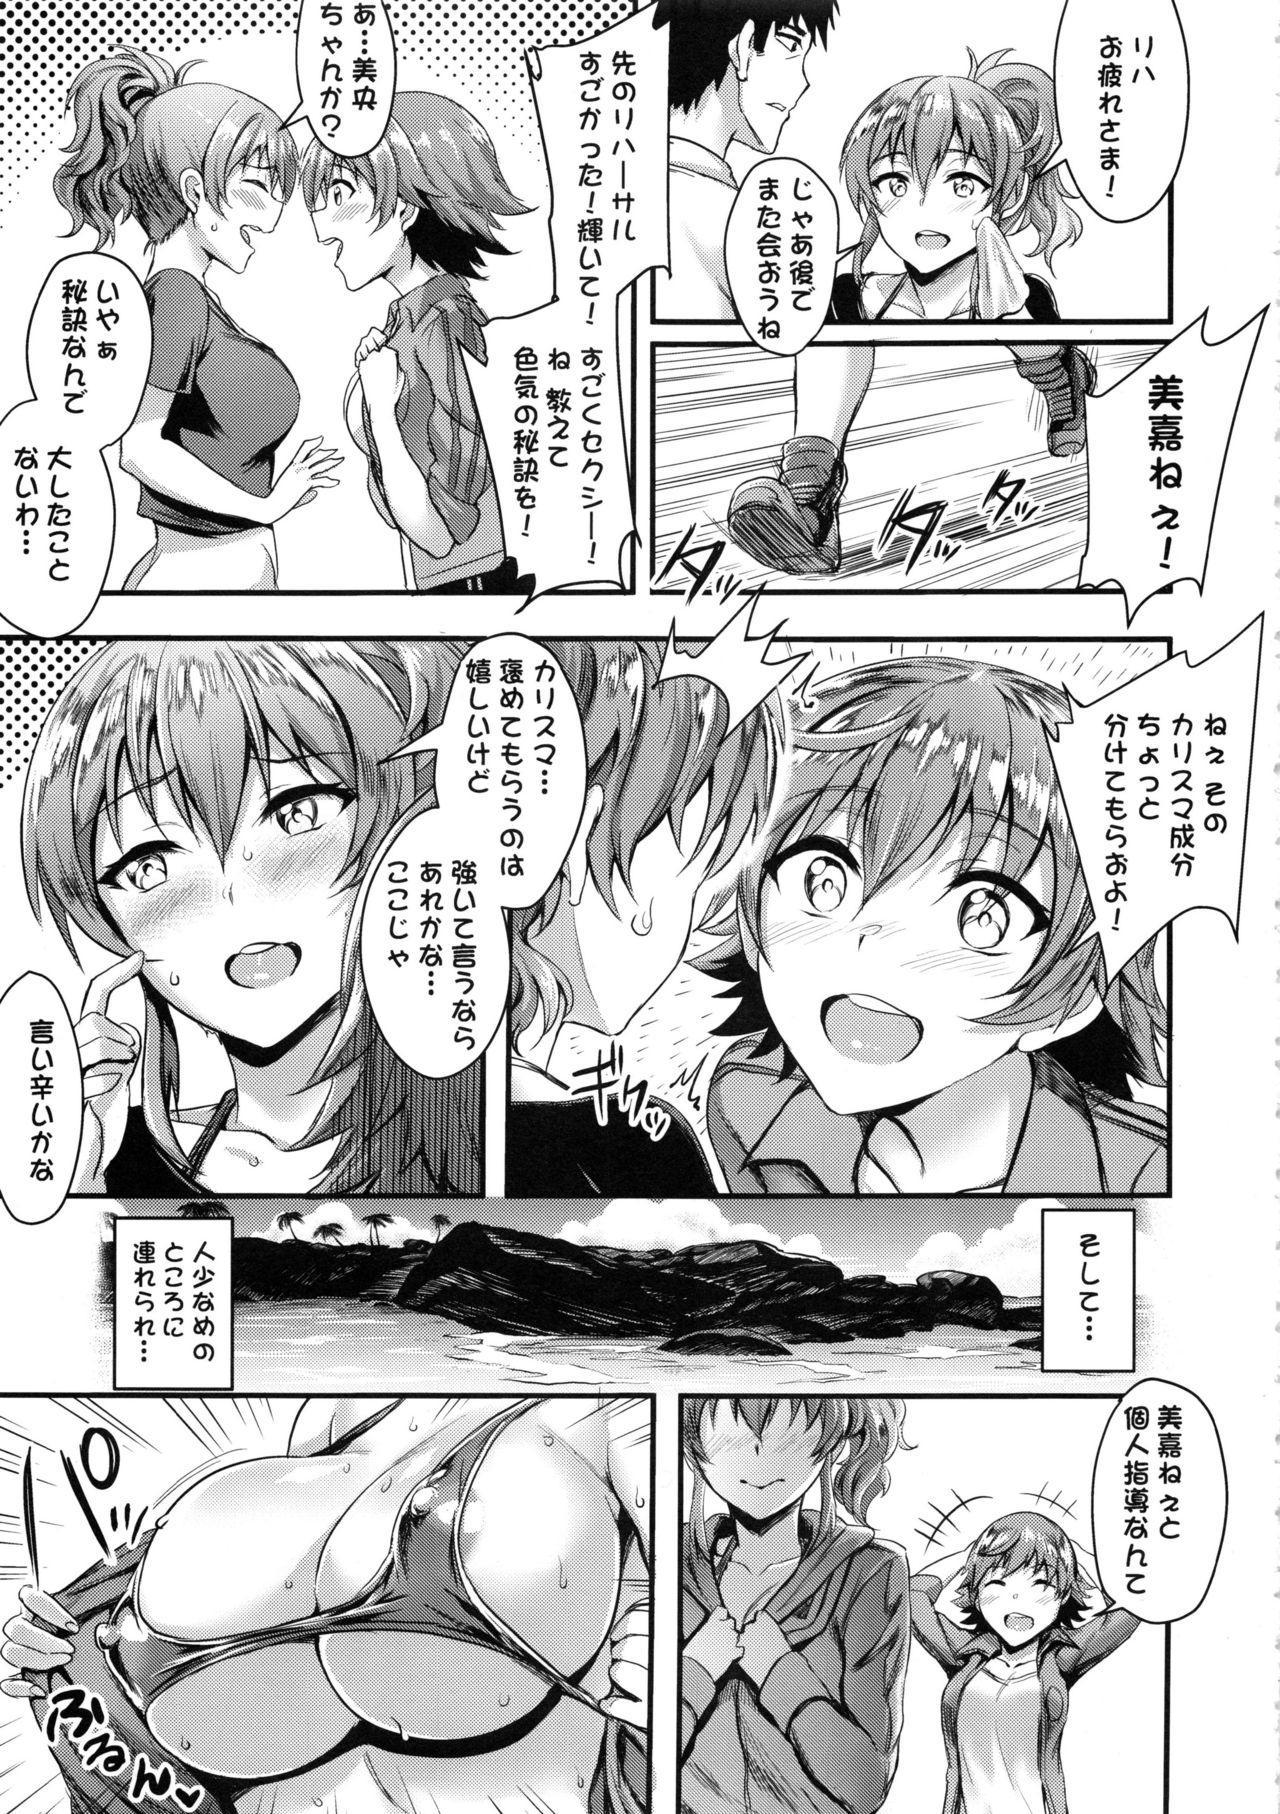 (C92) [BRIO (Puyocha)] Mika-nee no Tanryoku Shidou - Mika's Guide to Self-Confidence (THE IDOLM@STER CINDERELLA GIRLS) 3